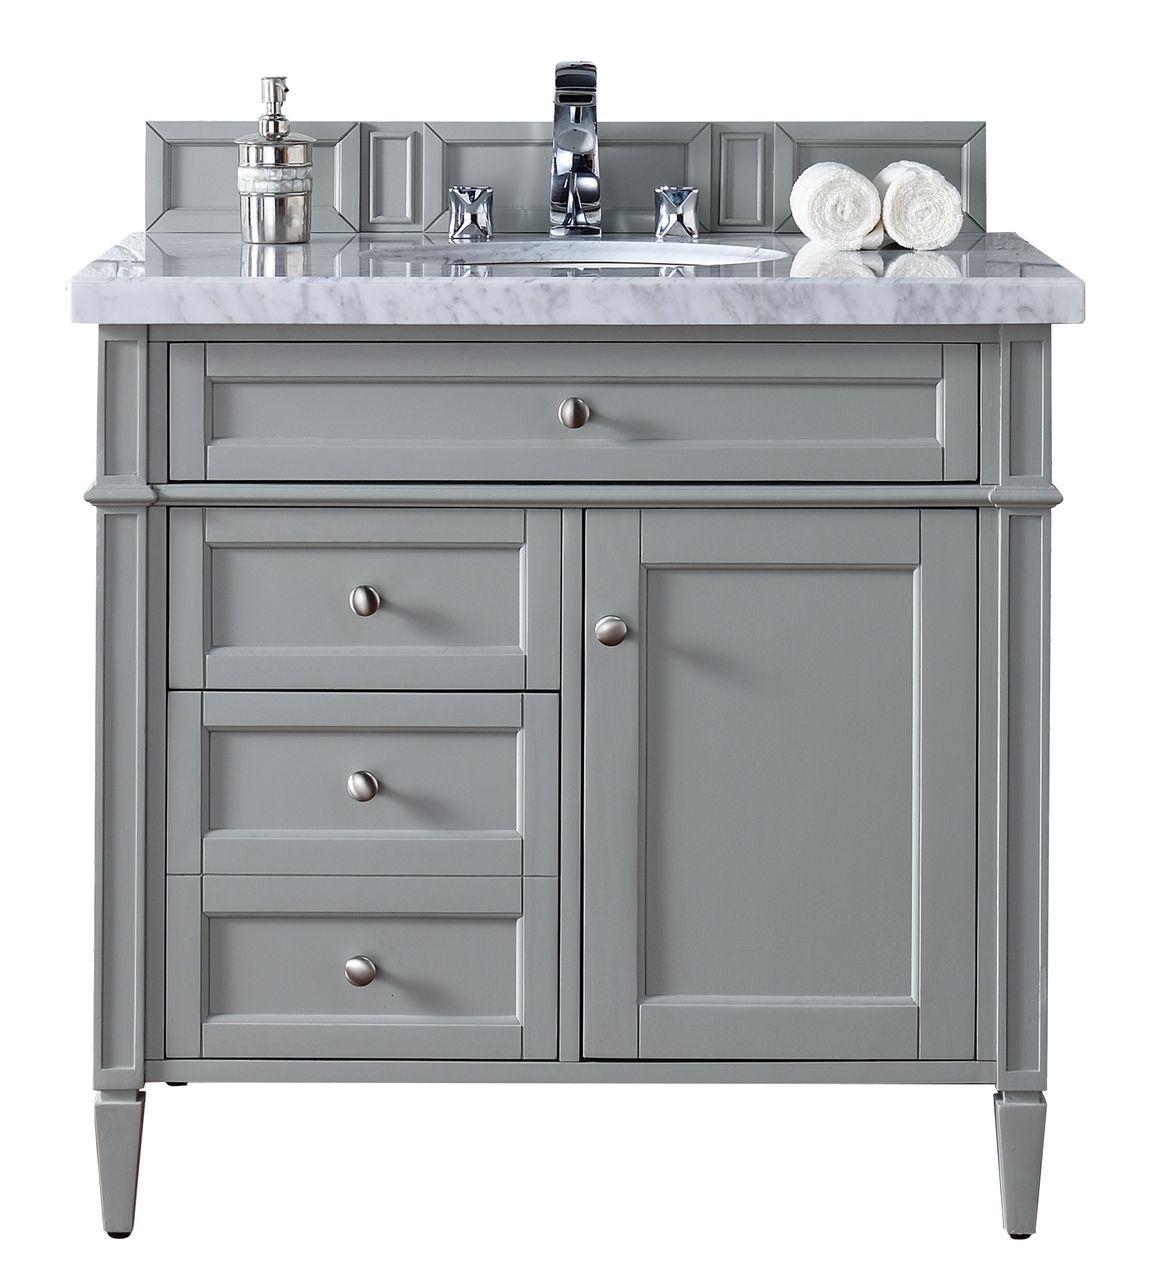 36 Brittany Single Bathroom Vanity Urban Gray Soft Close Doors Drawers Grey Bathroom Vanity Single Bathroom Vanity Bathroom Vanity Base